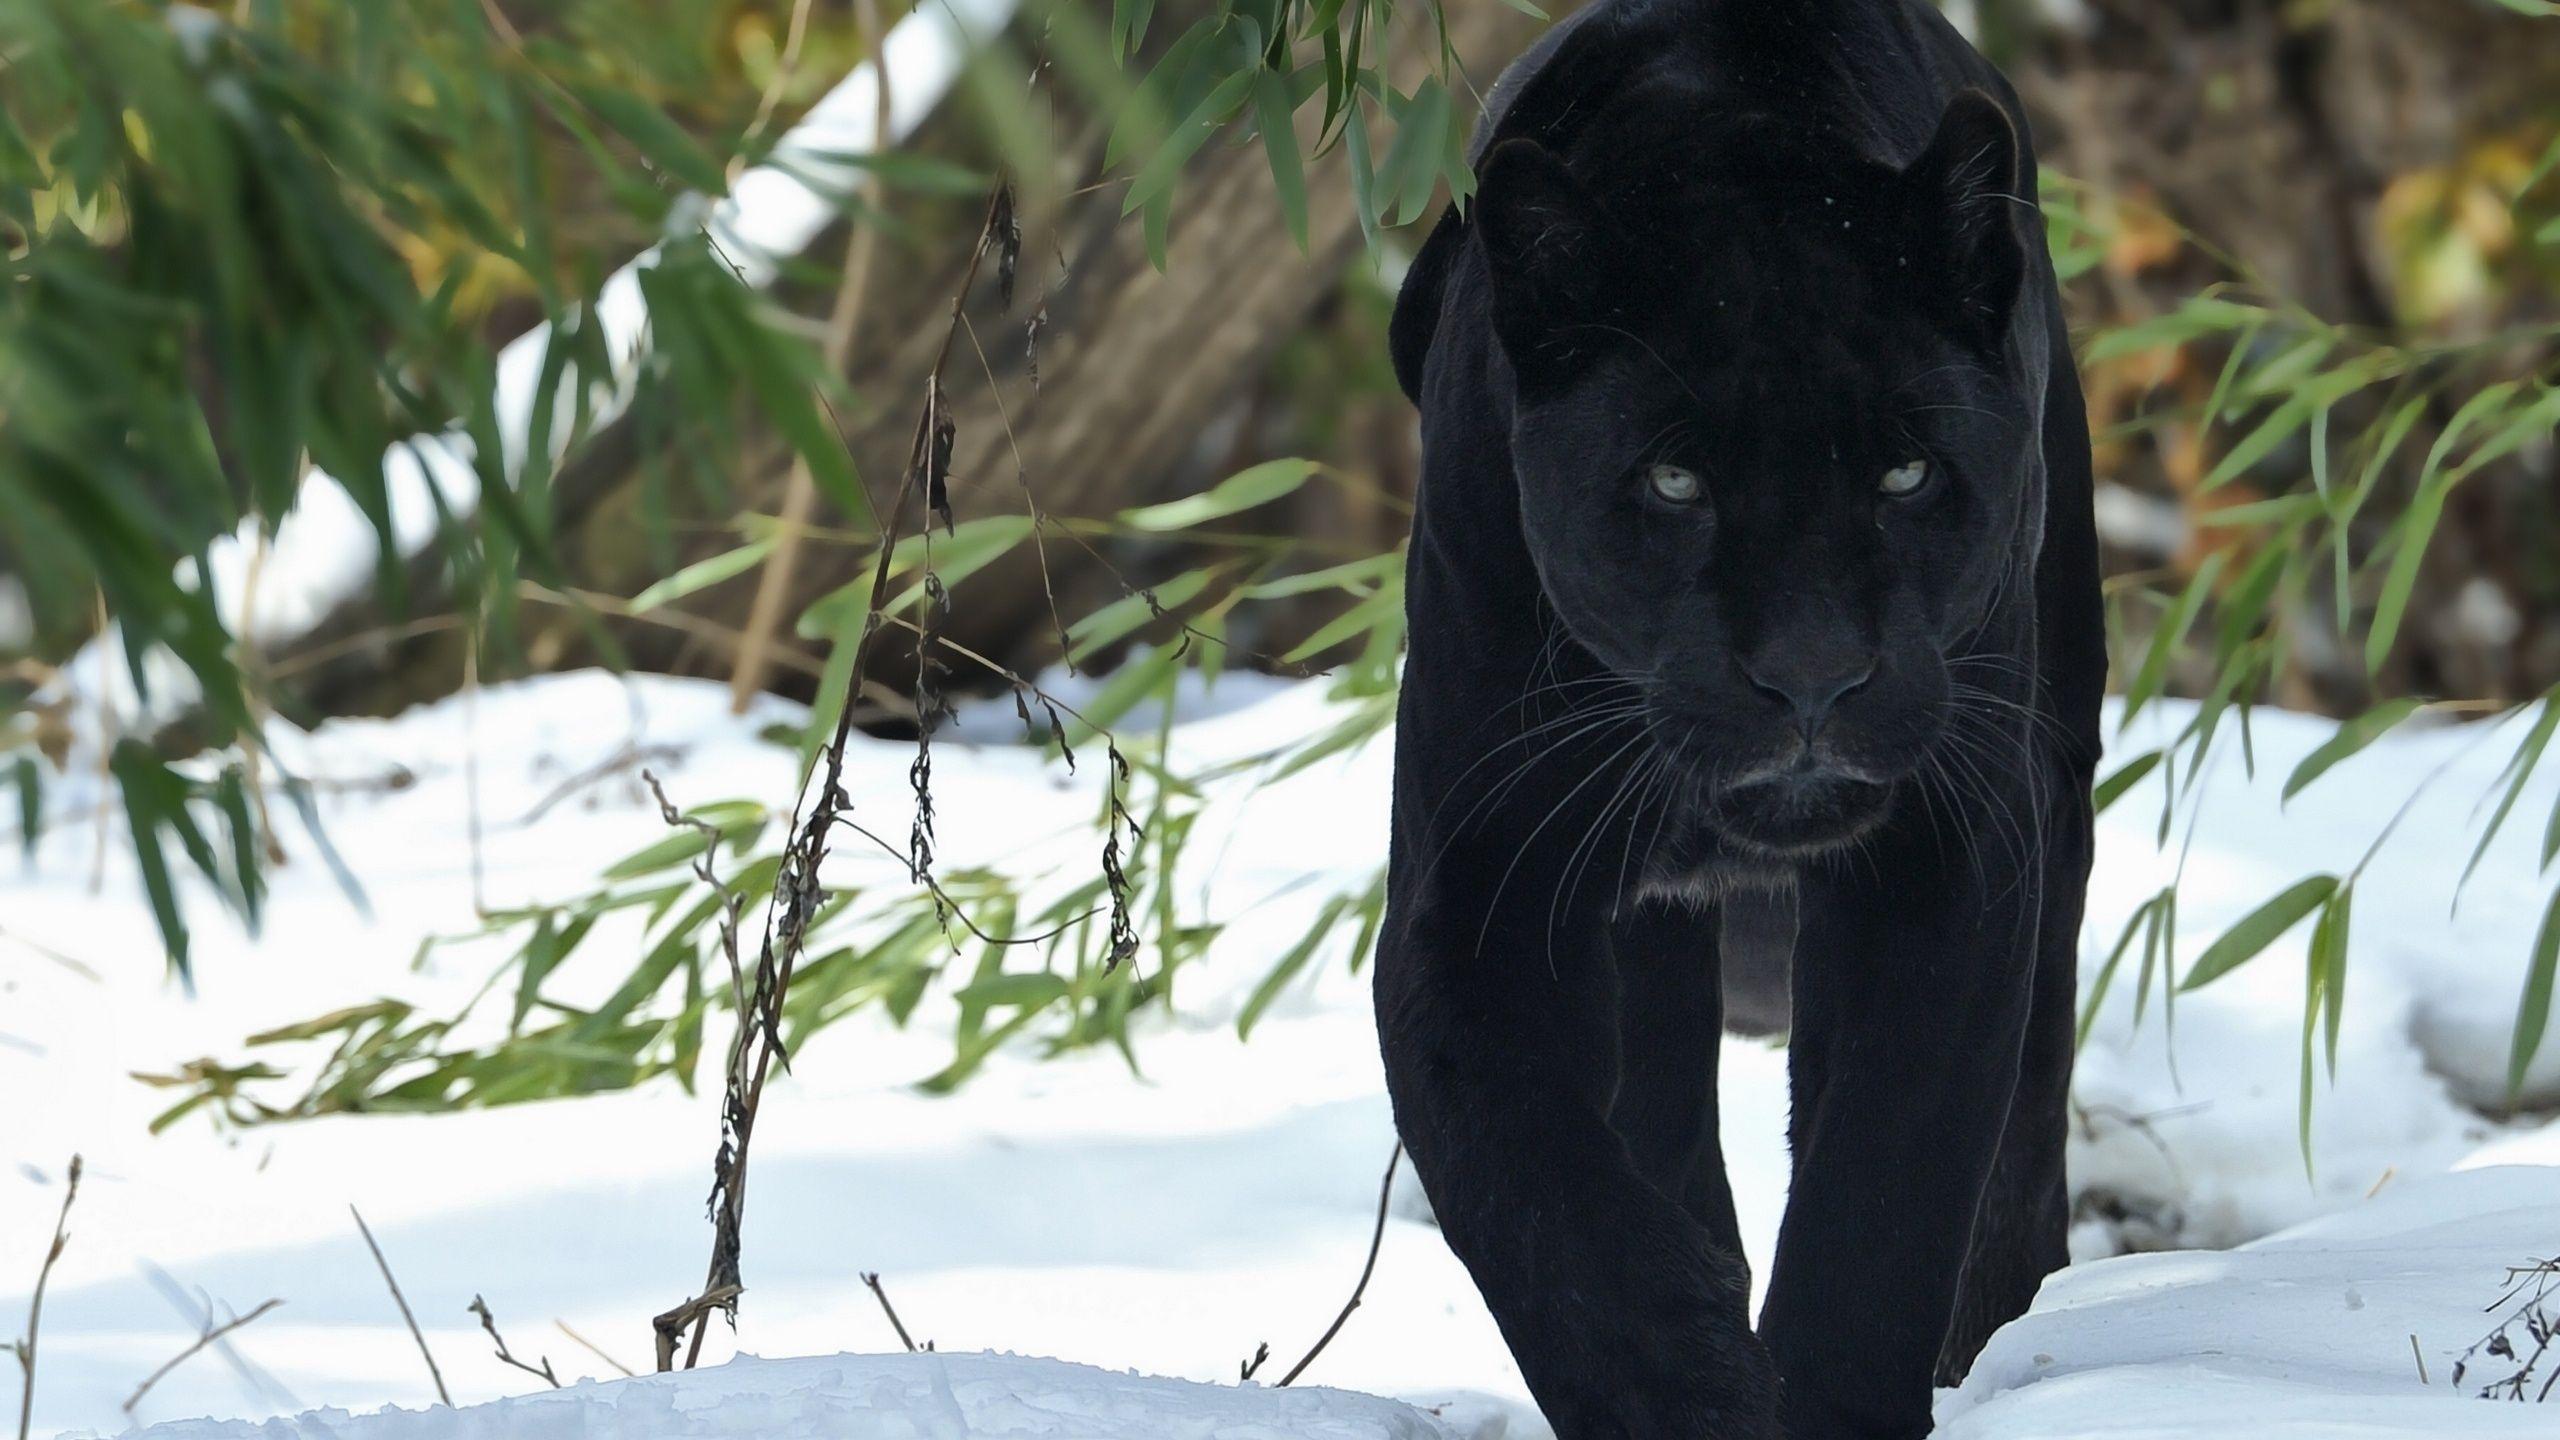 White Panther - Black Cat White Snow Panther Animals Wallpaper